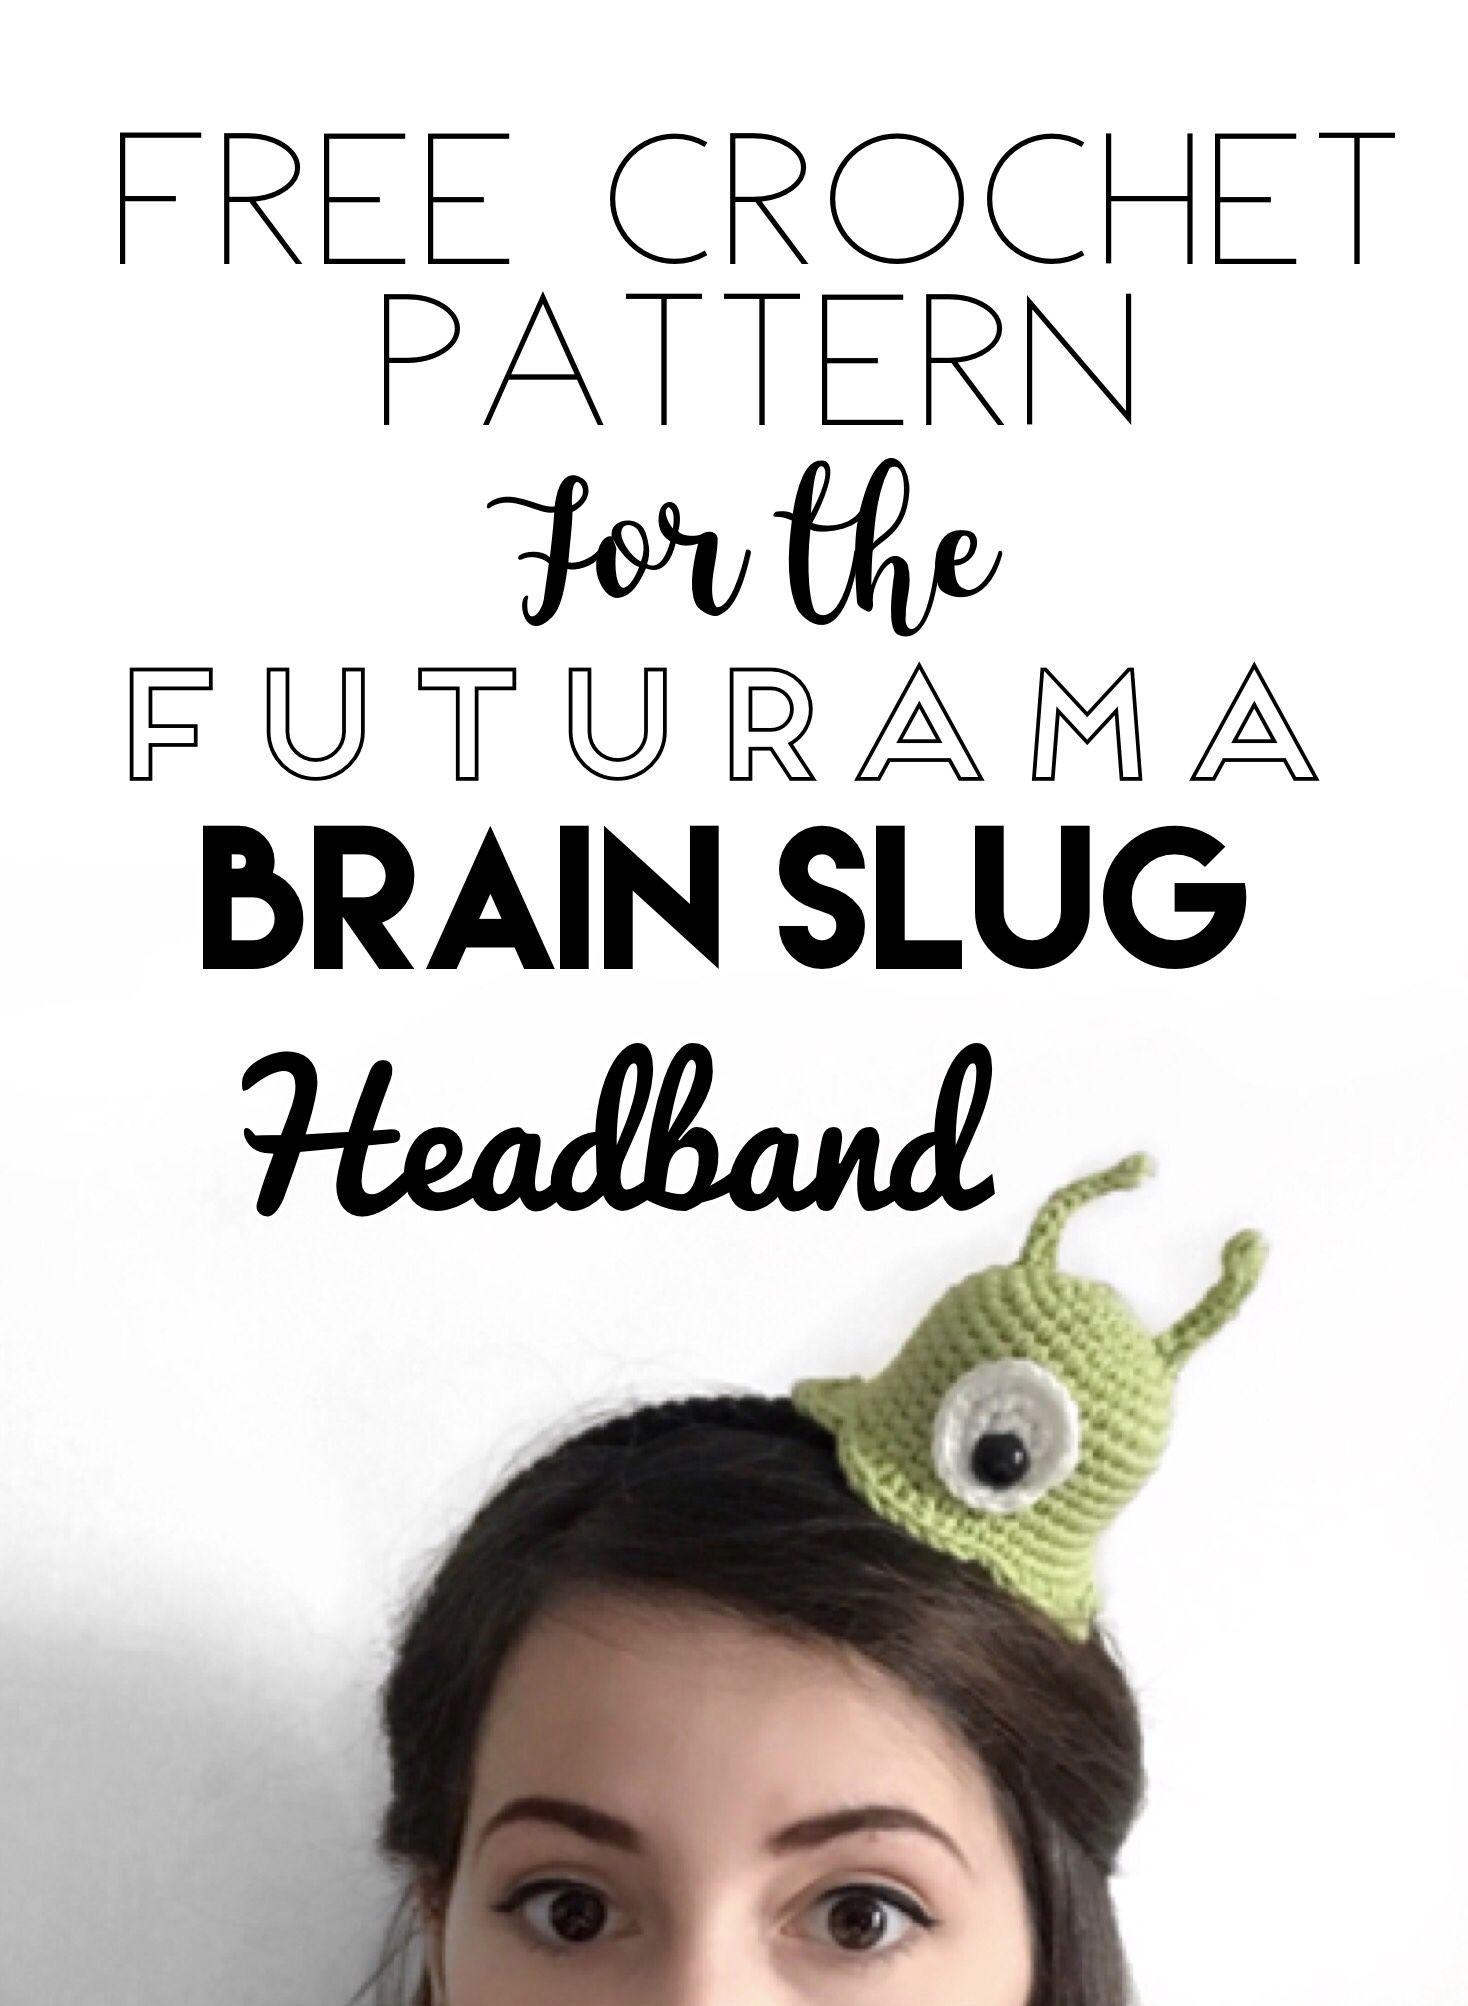 Free crochet pattern! | amigurumi | Pinterest